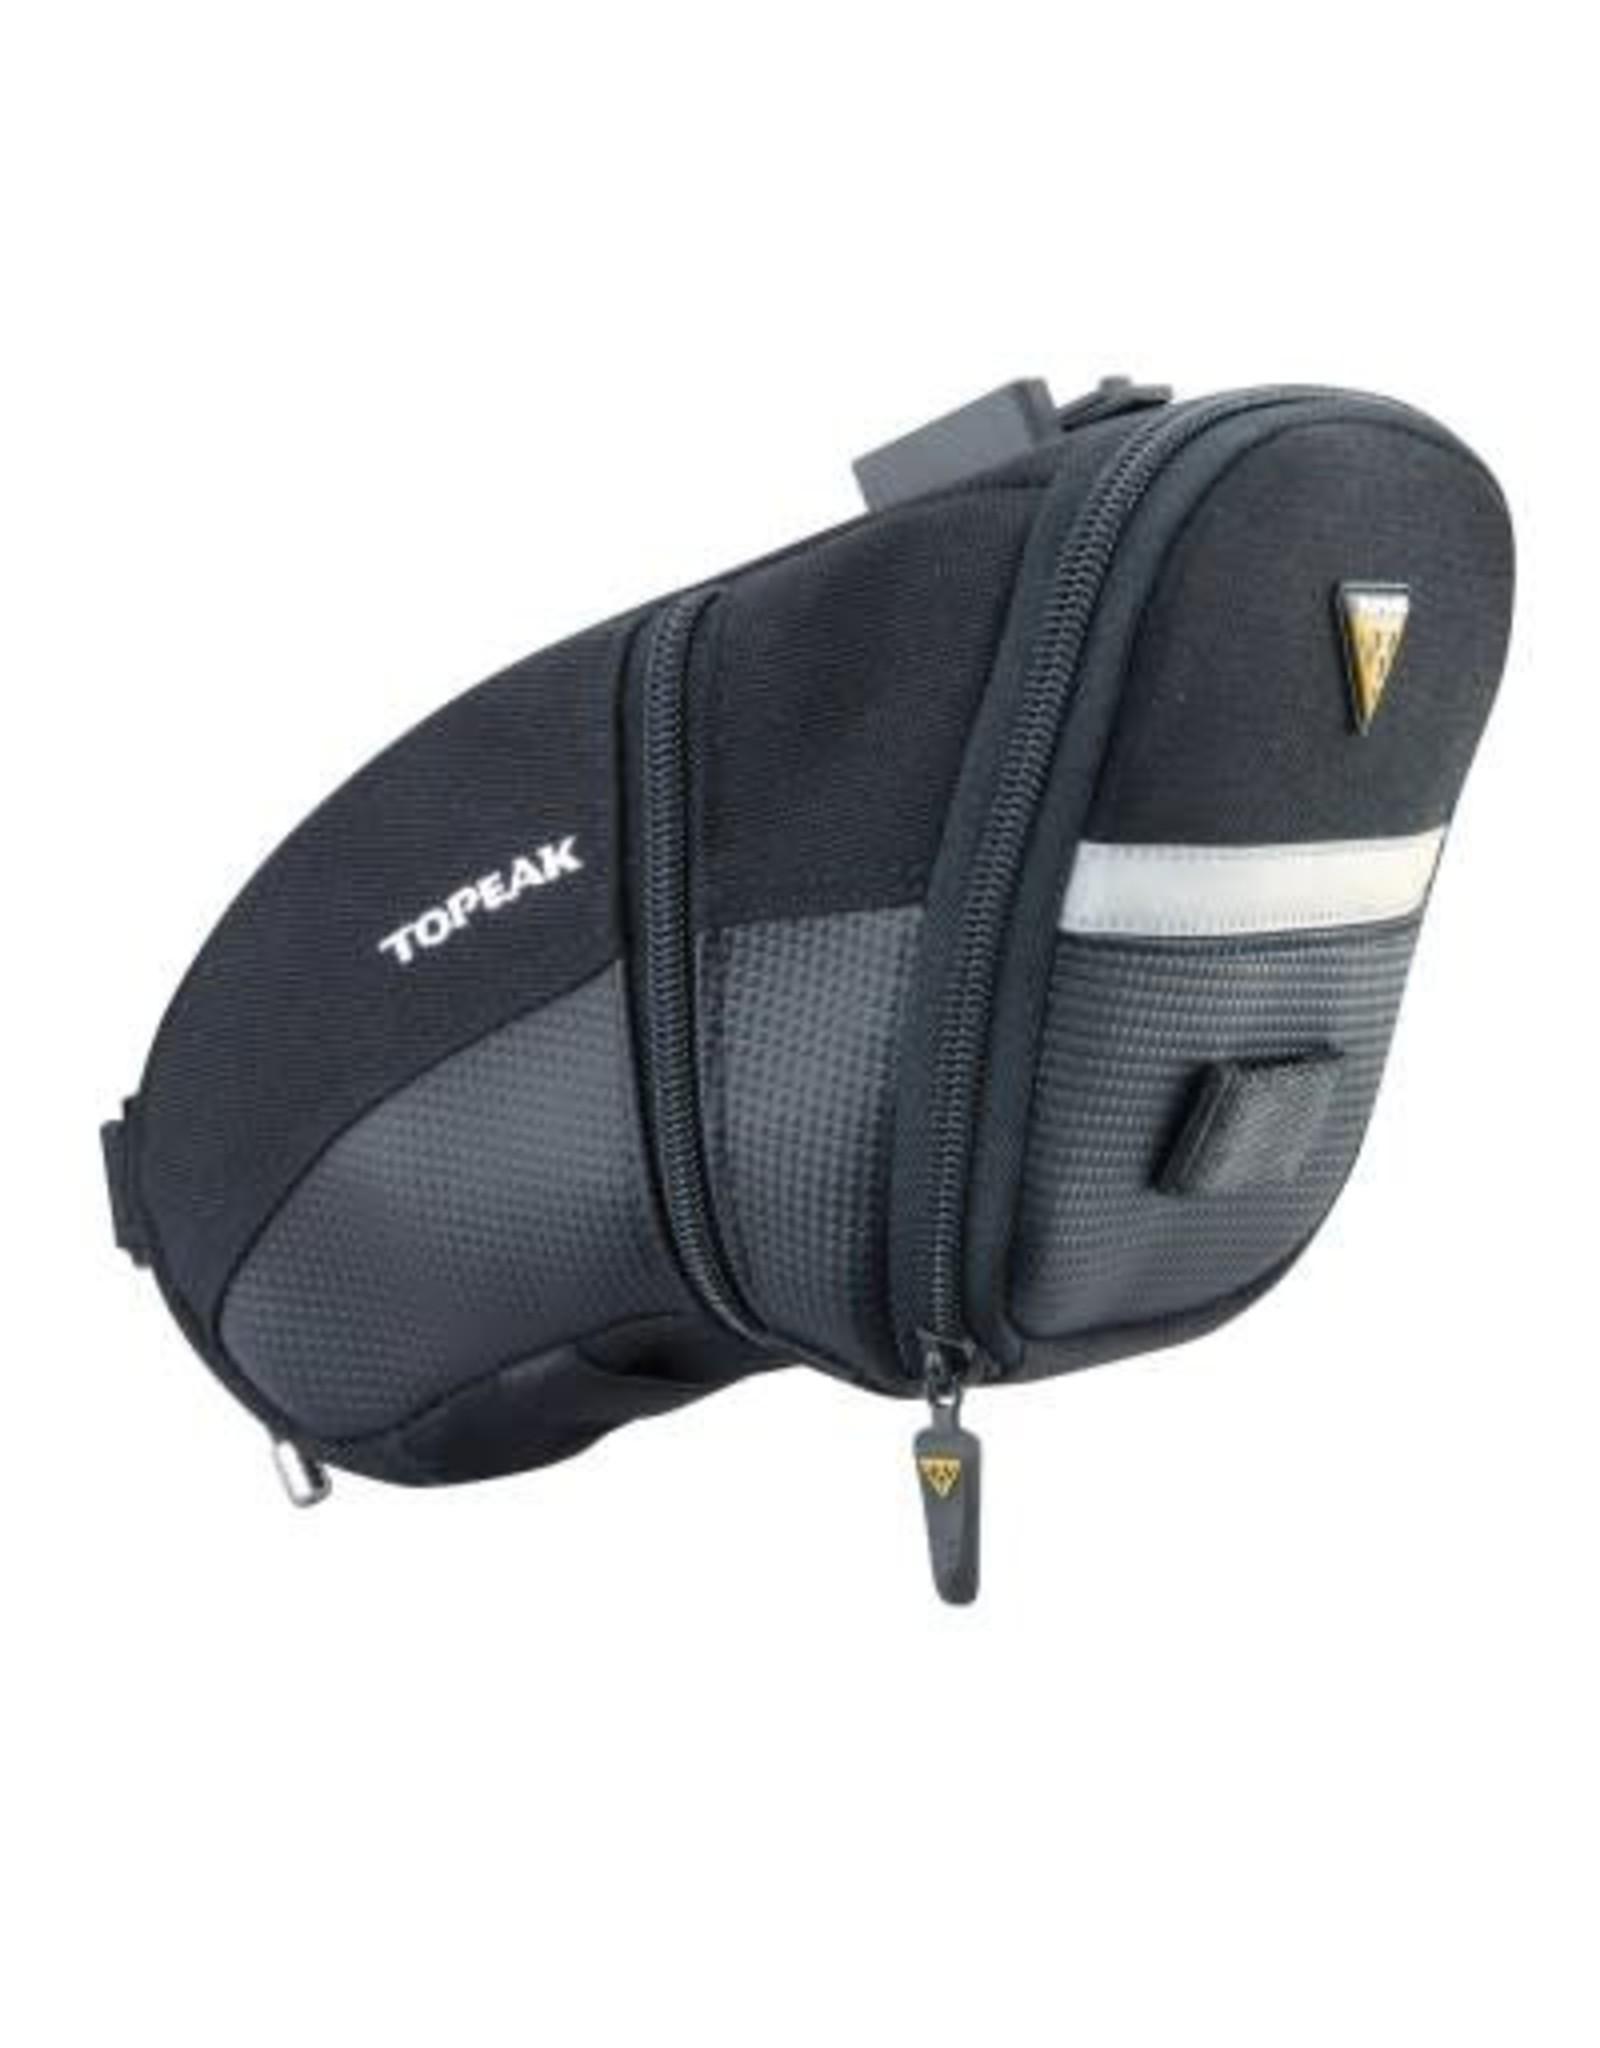 Topeak WEDGE AERO W/STRAP MEDIUM